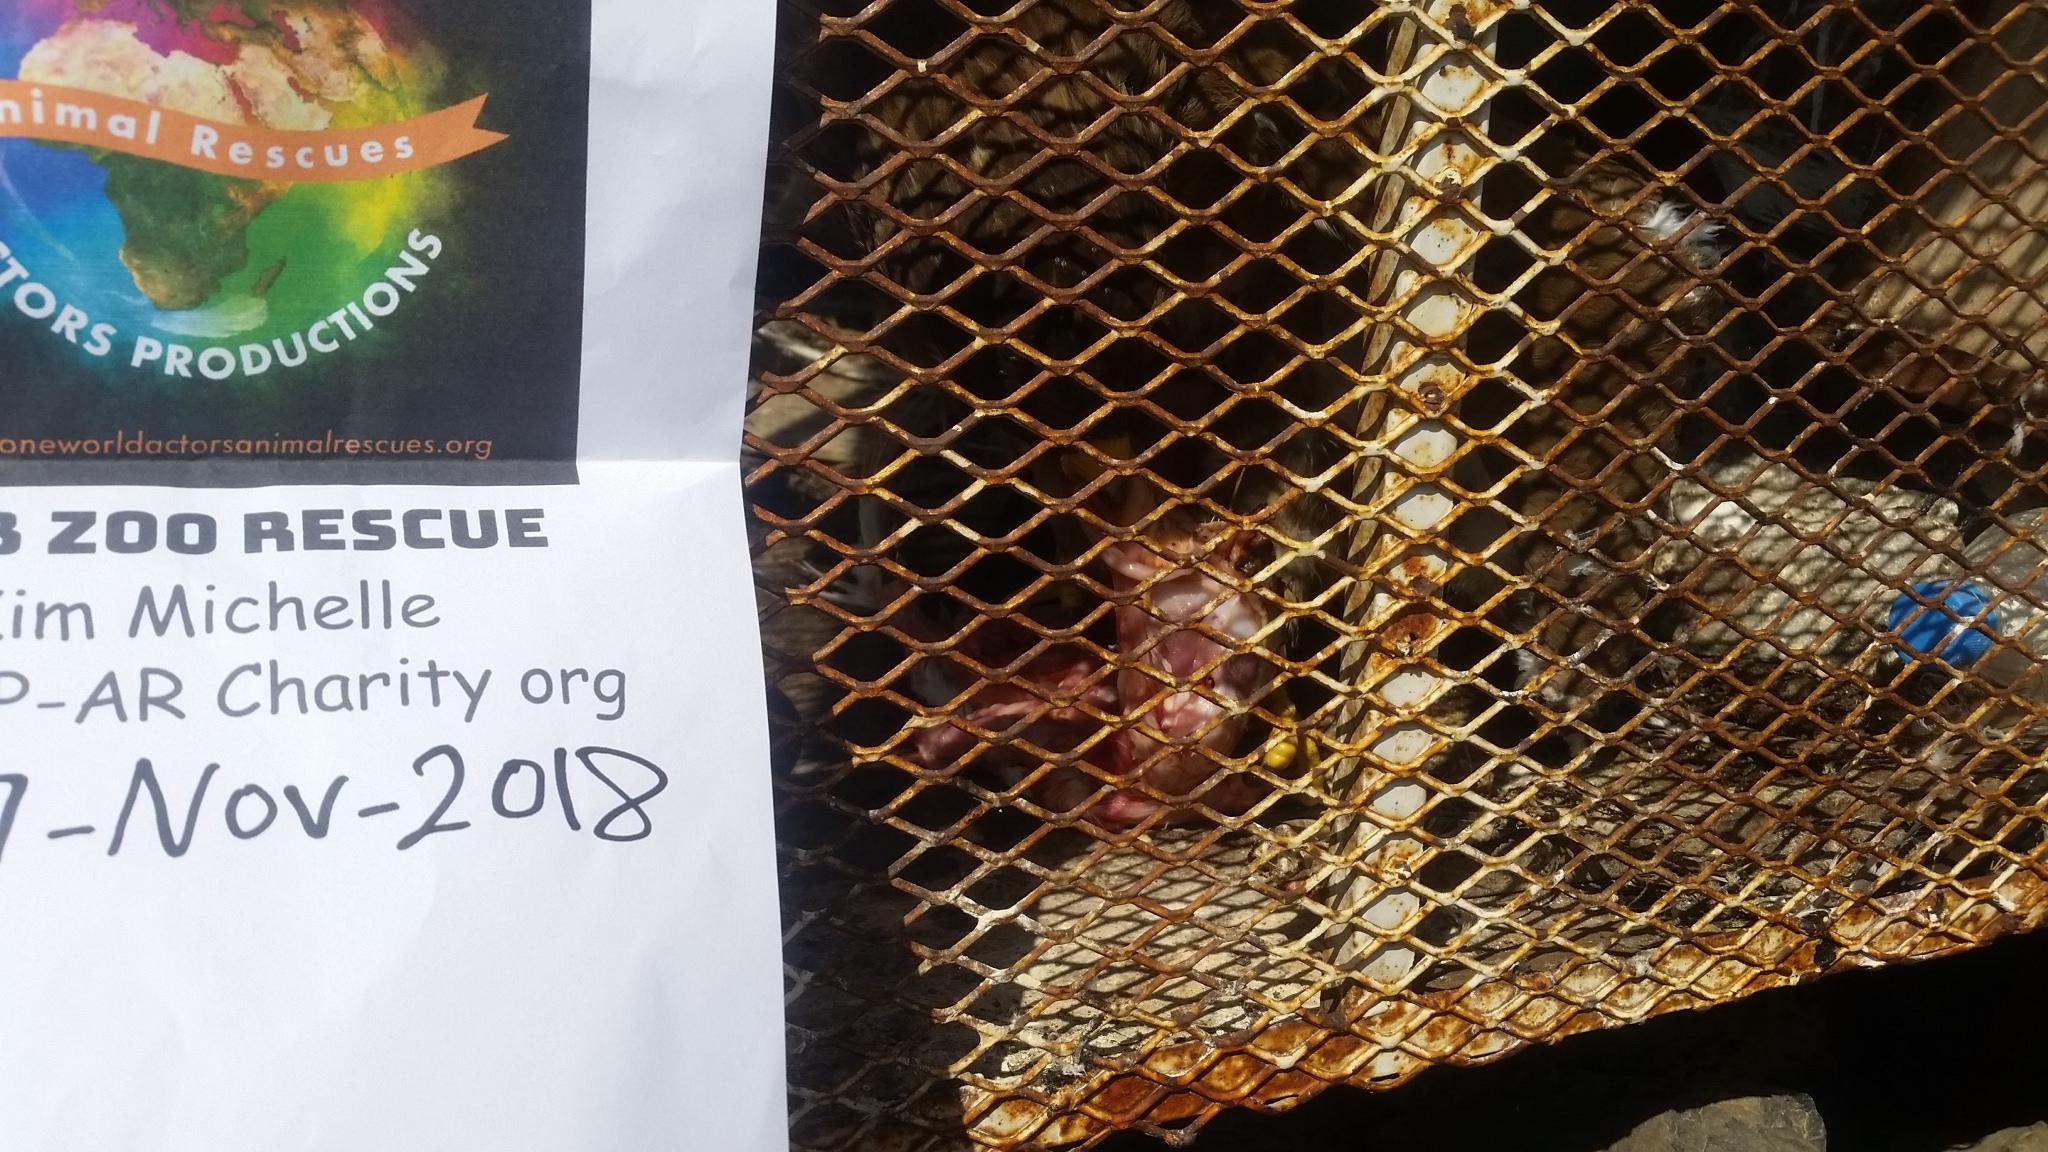 ibb zoo eagle eating OWAP AR delivery chickens 2 Nov 7 sign 2018 Hisham pic yemen.jpg